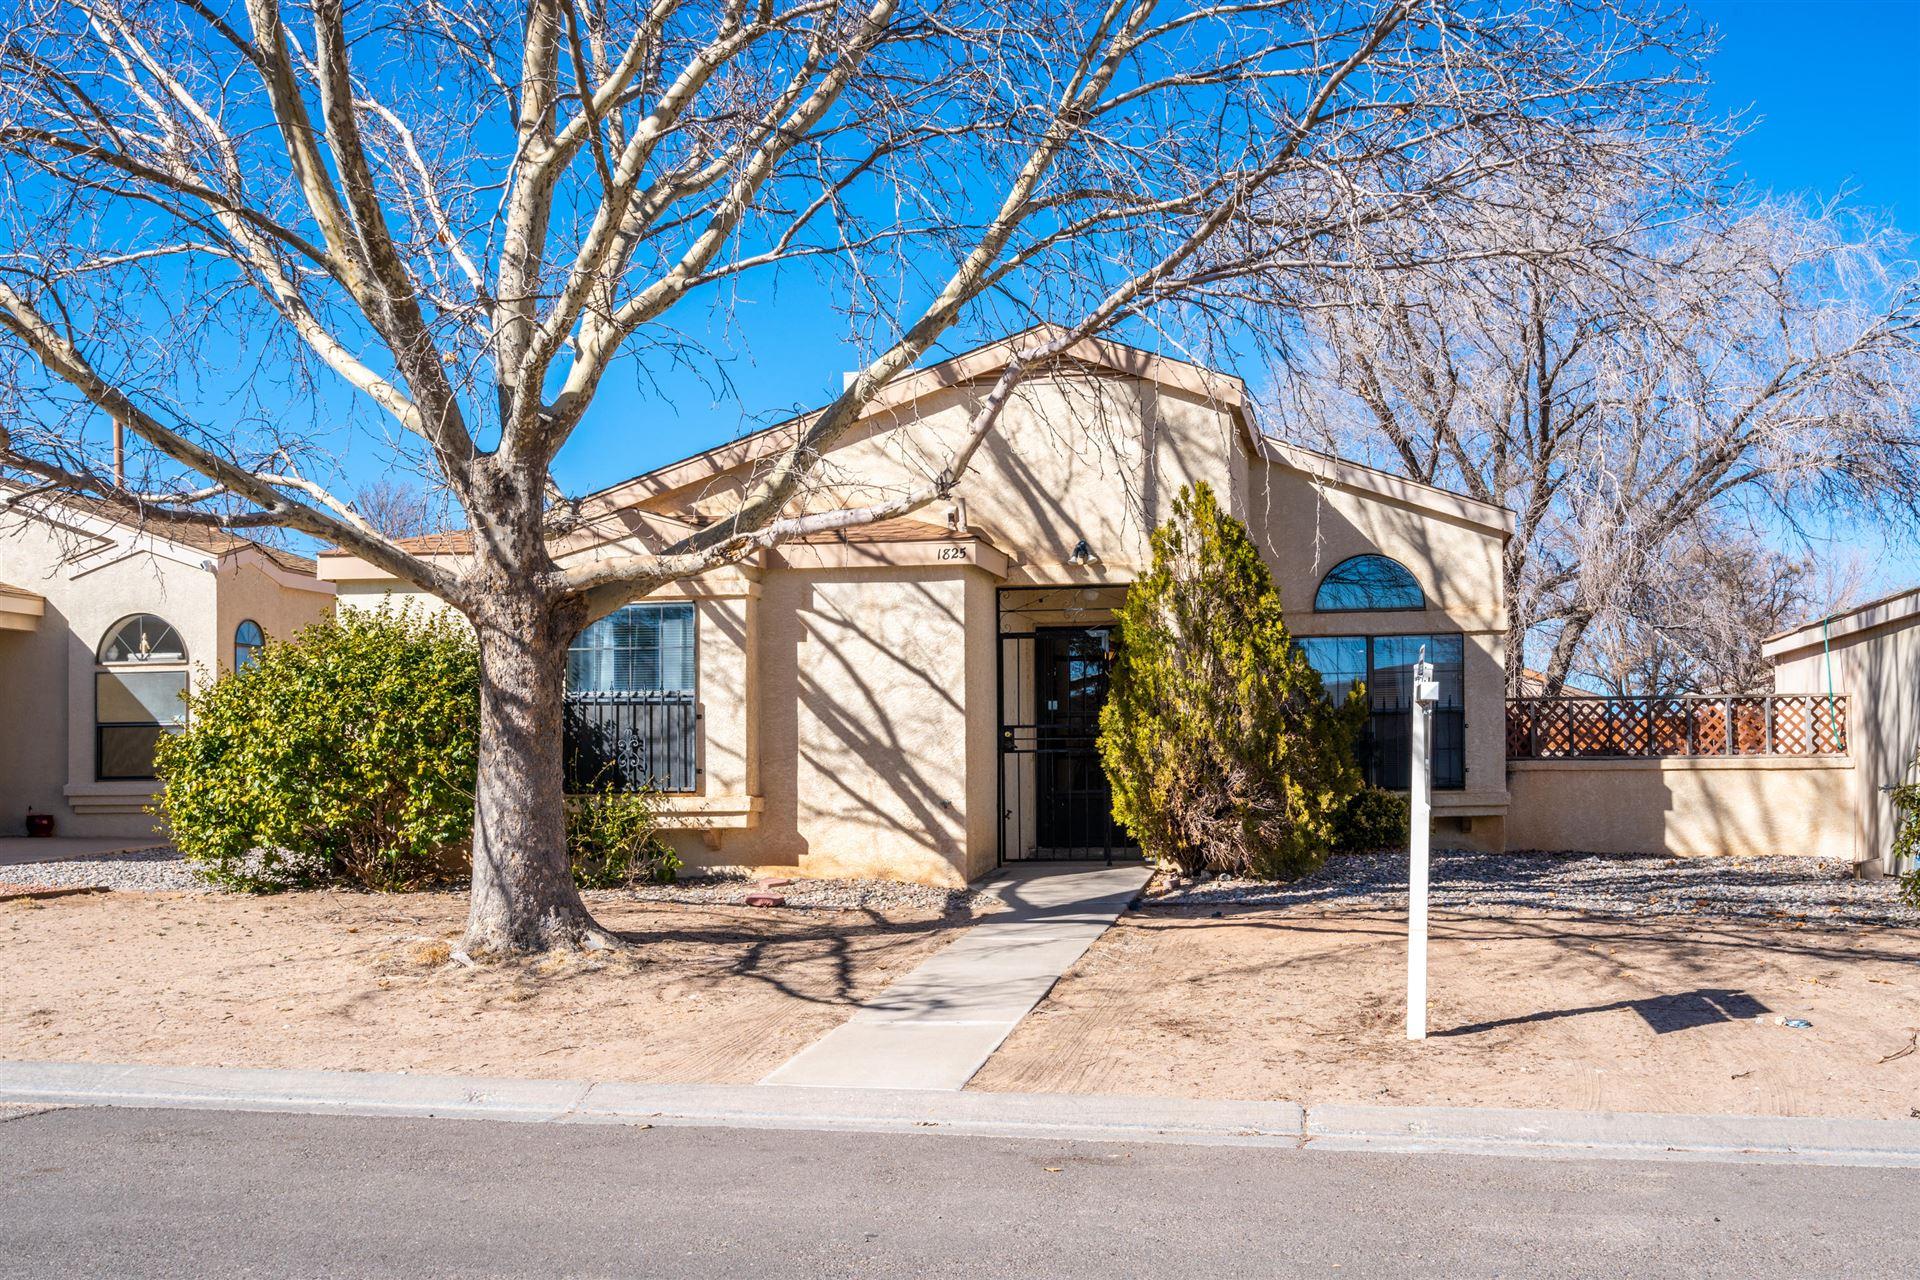 1825 BLACKBERRY Road NE, Rio Rancho, NM 87144 - MLS#: 986799